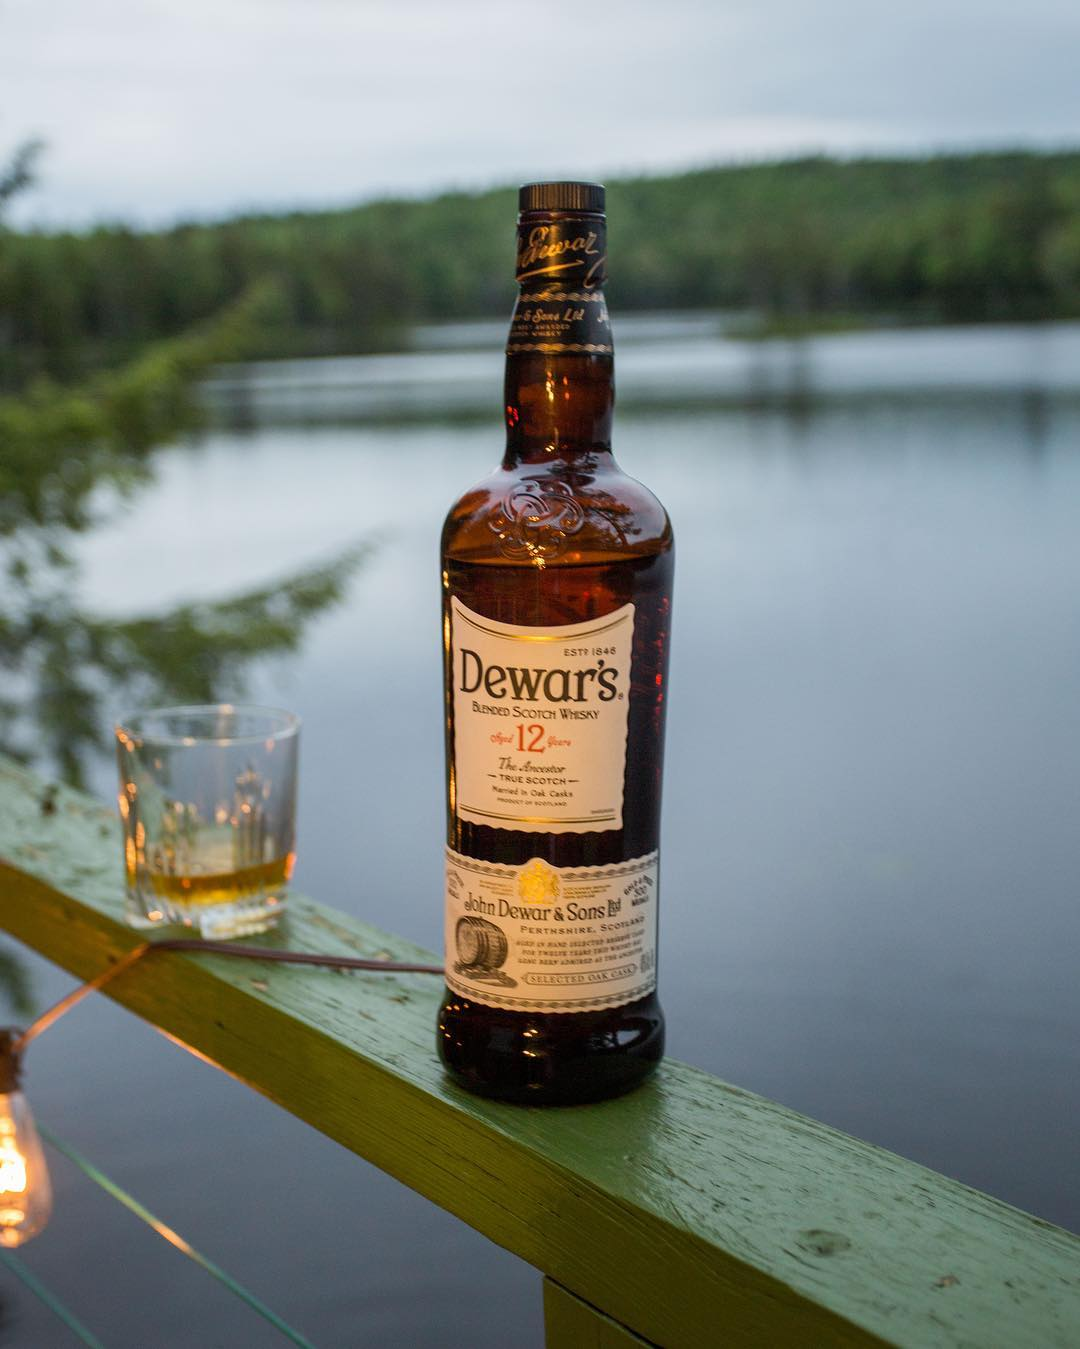 Dewar's Announces New North American Brand Ambassador